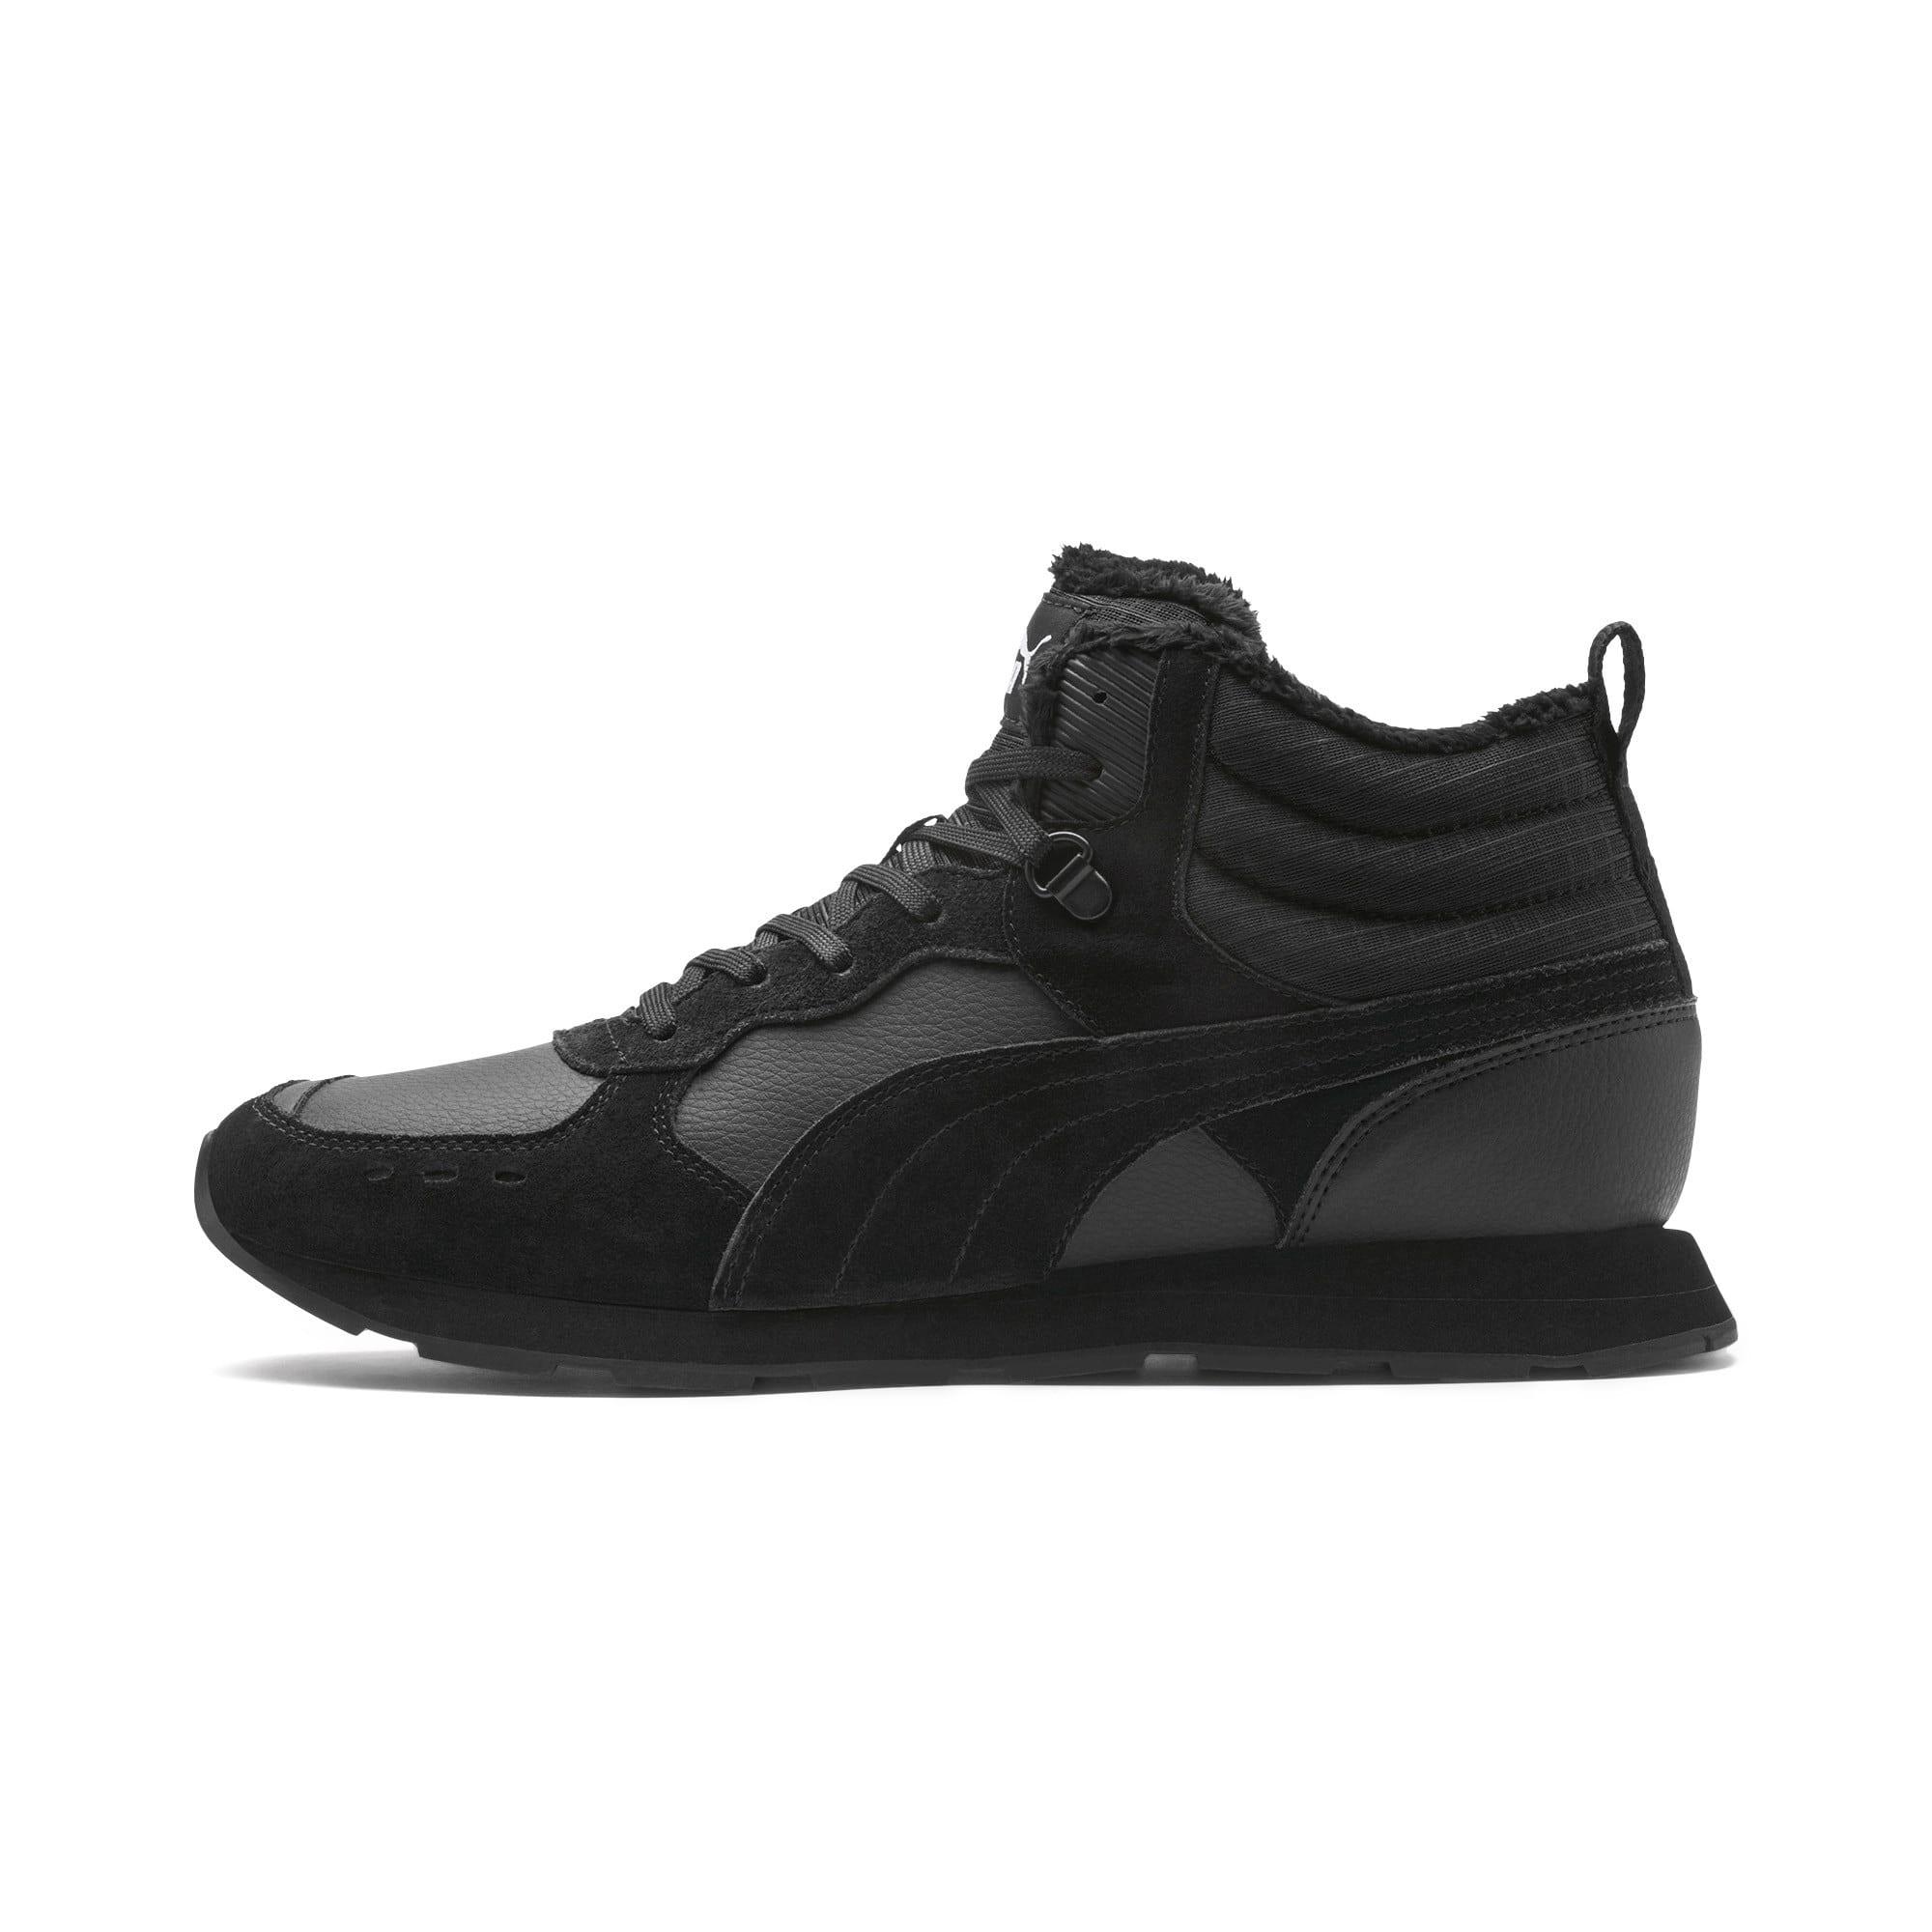 Anteprima 1 di Vista Mid-Cut Winter Running Shoes, Puma Black-Puma White, medio